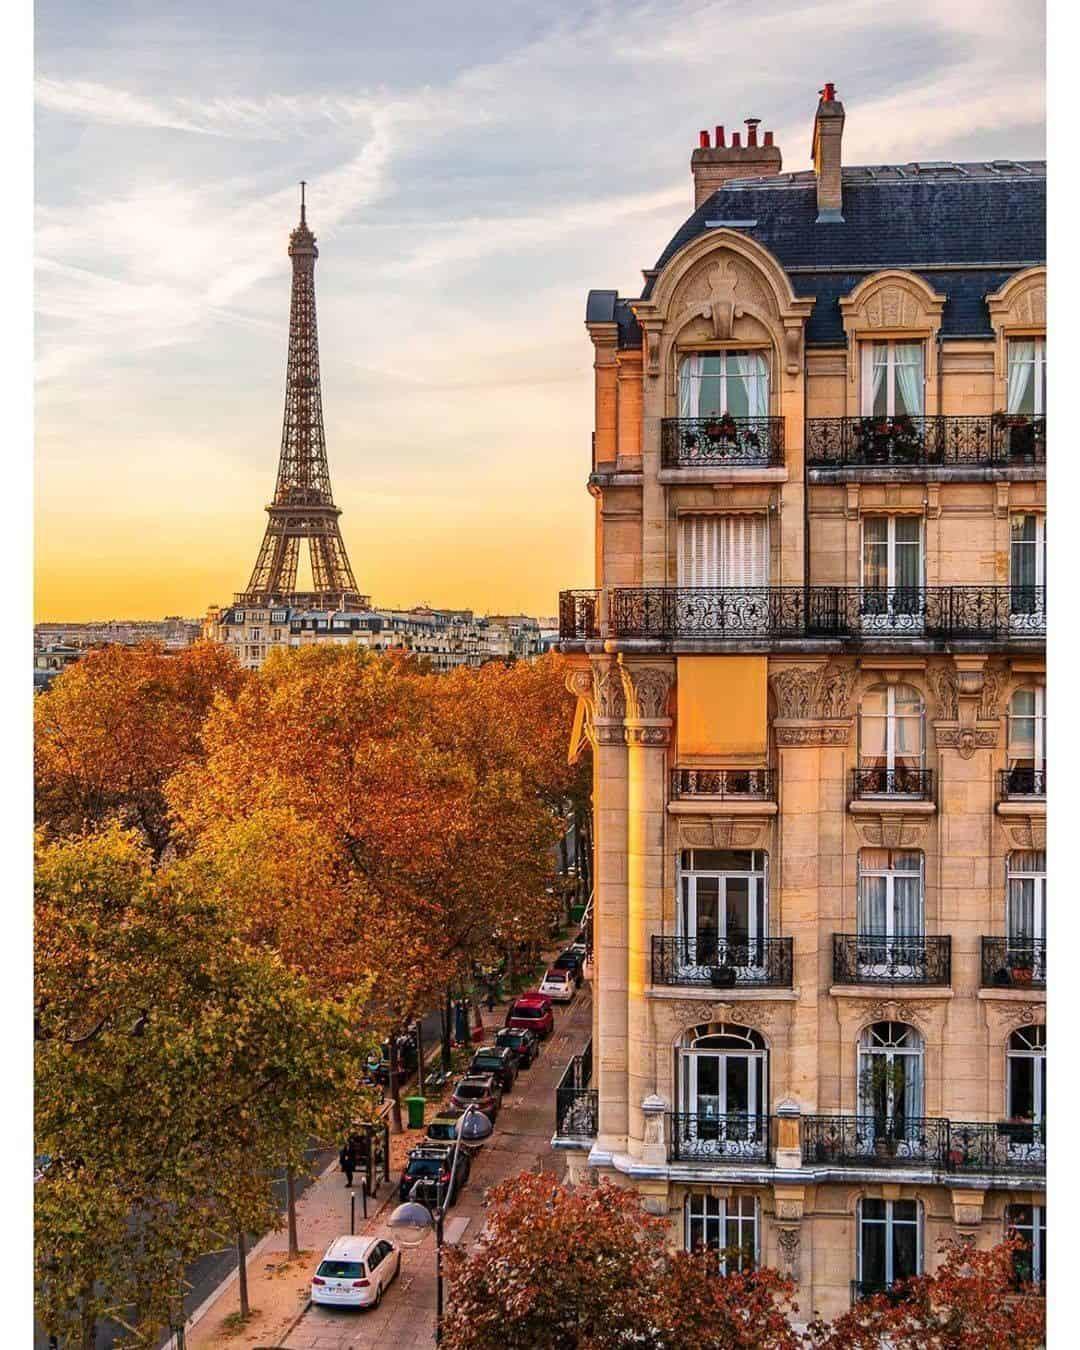 Eiffel Tower and Haussmann building in Paris petiteinparis